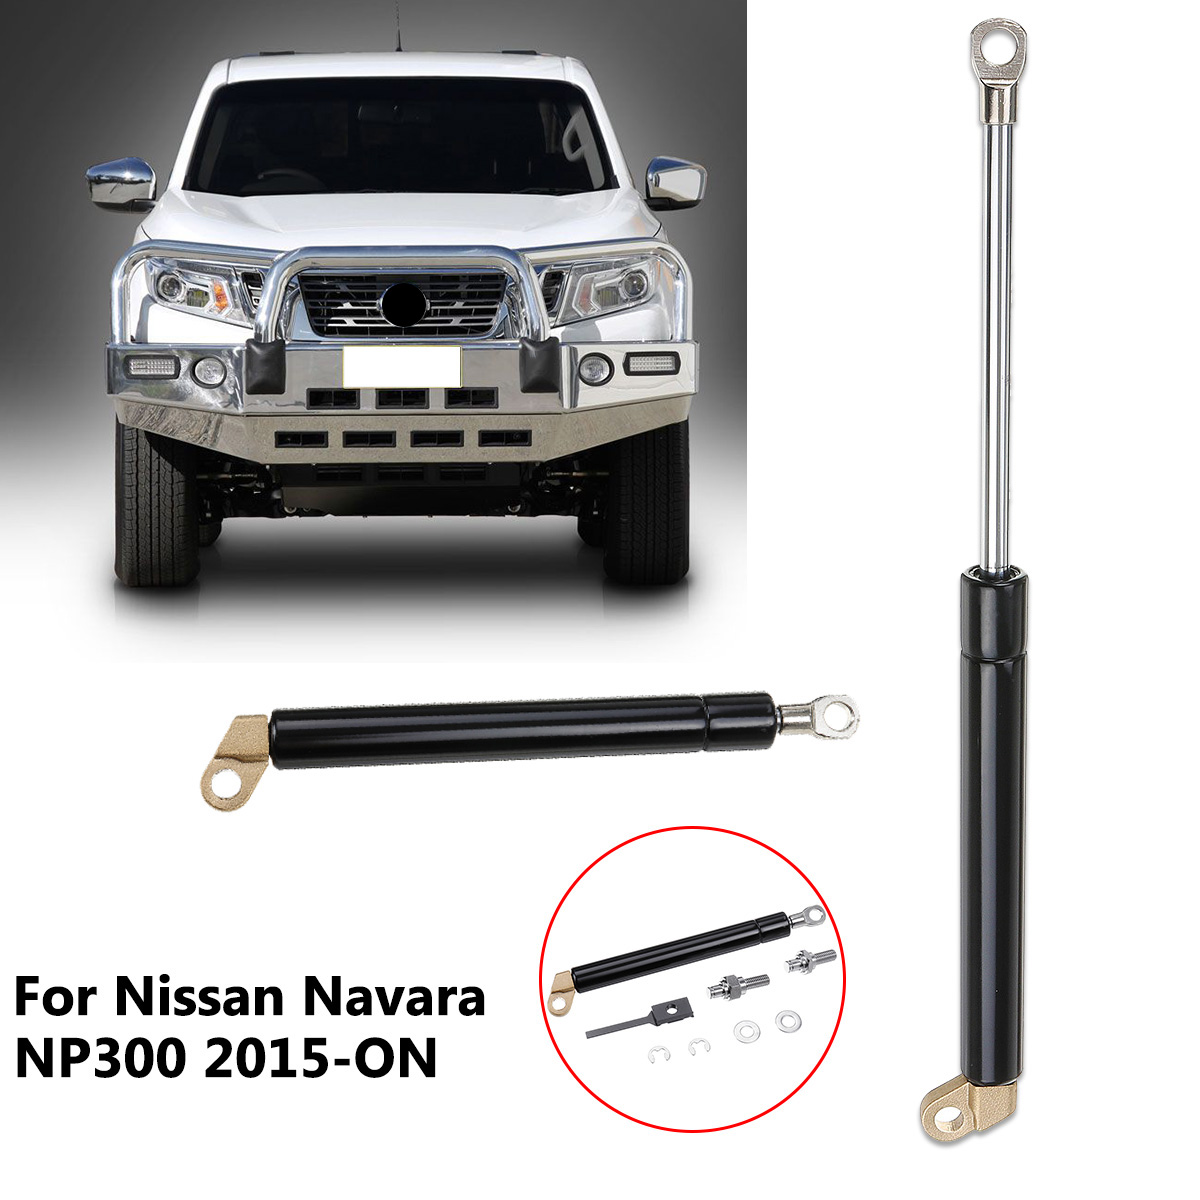 1 Pcs Traseiro Trunk Gas Strut NP300 Liftgate Bagageira Fácil Desacelerar Para Nissan Navara 2015 2016 2017 2018 2019